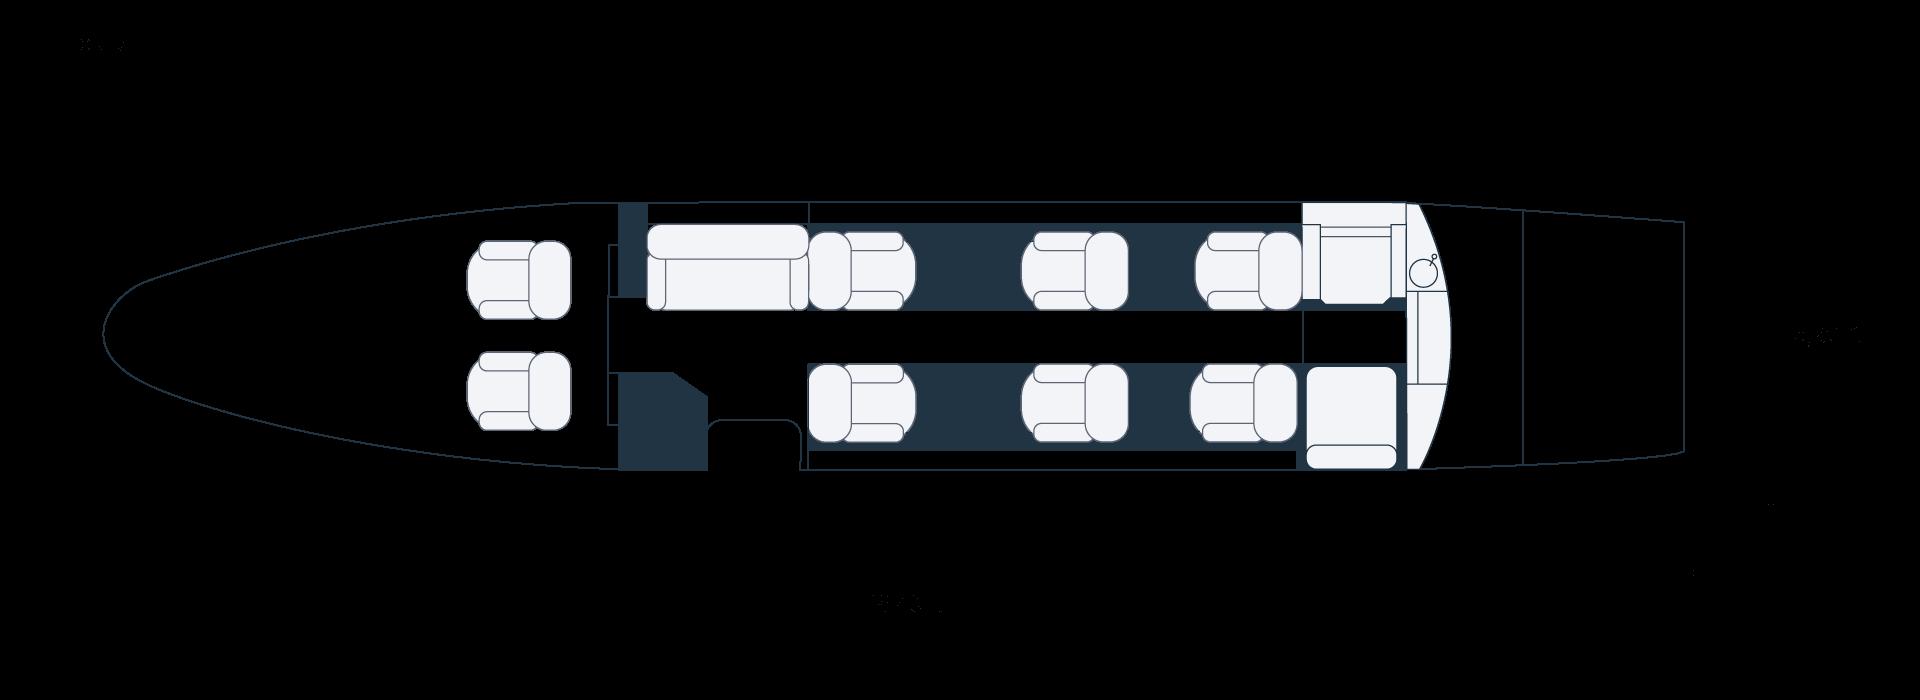 Grundriss eines Cessna Citation XLS D-CKHG Privatjets